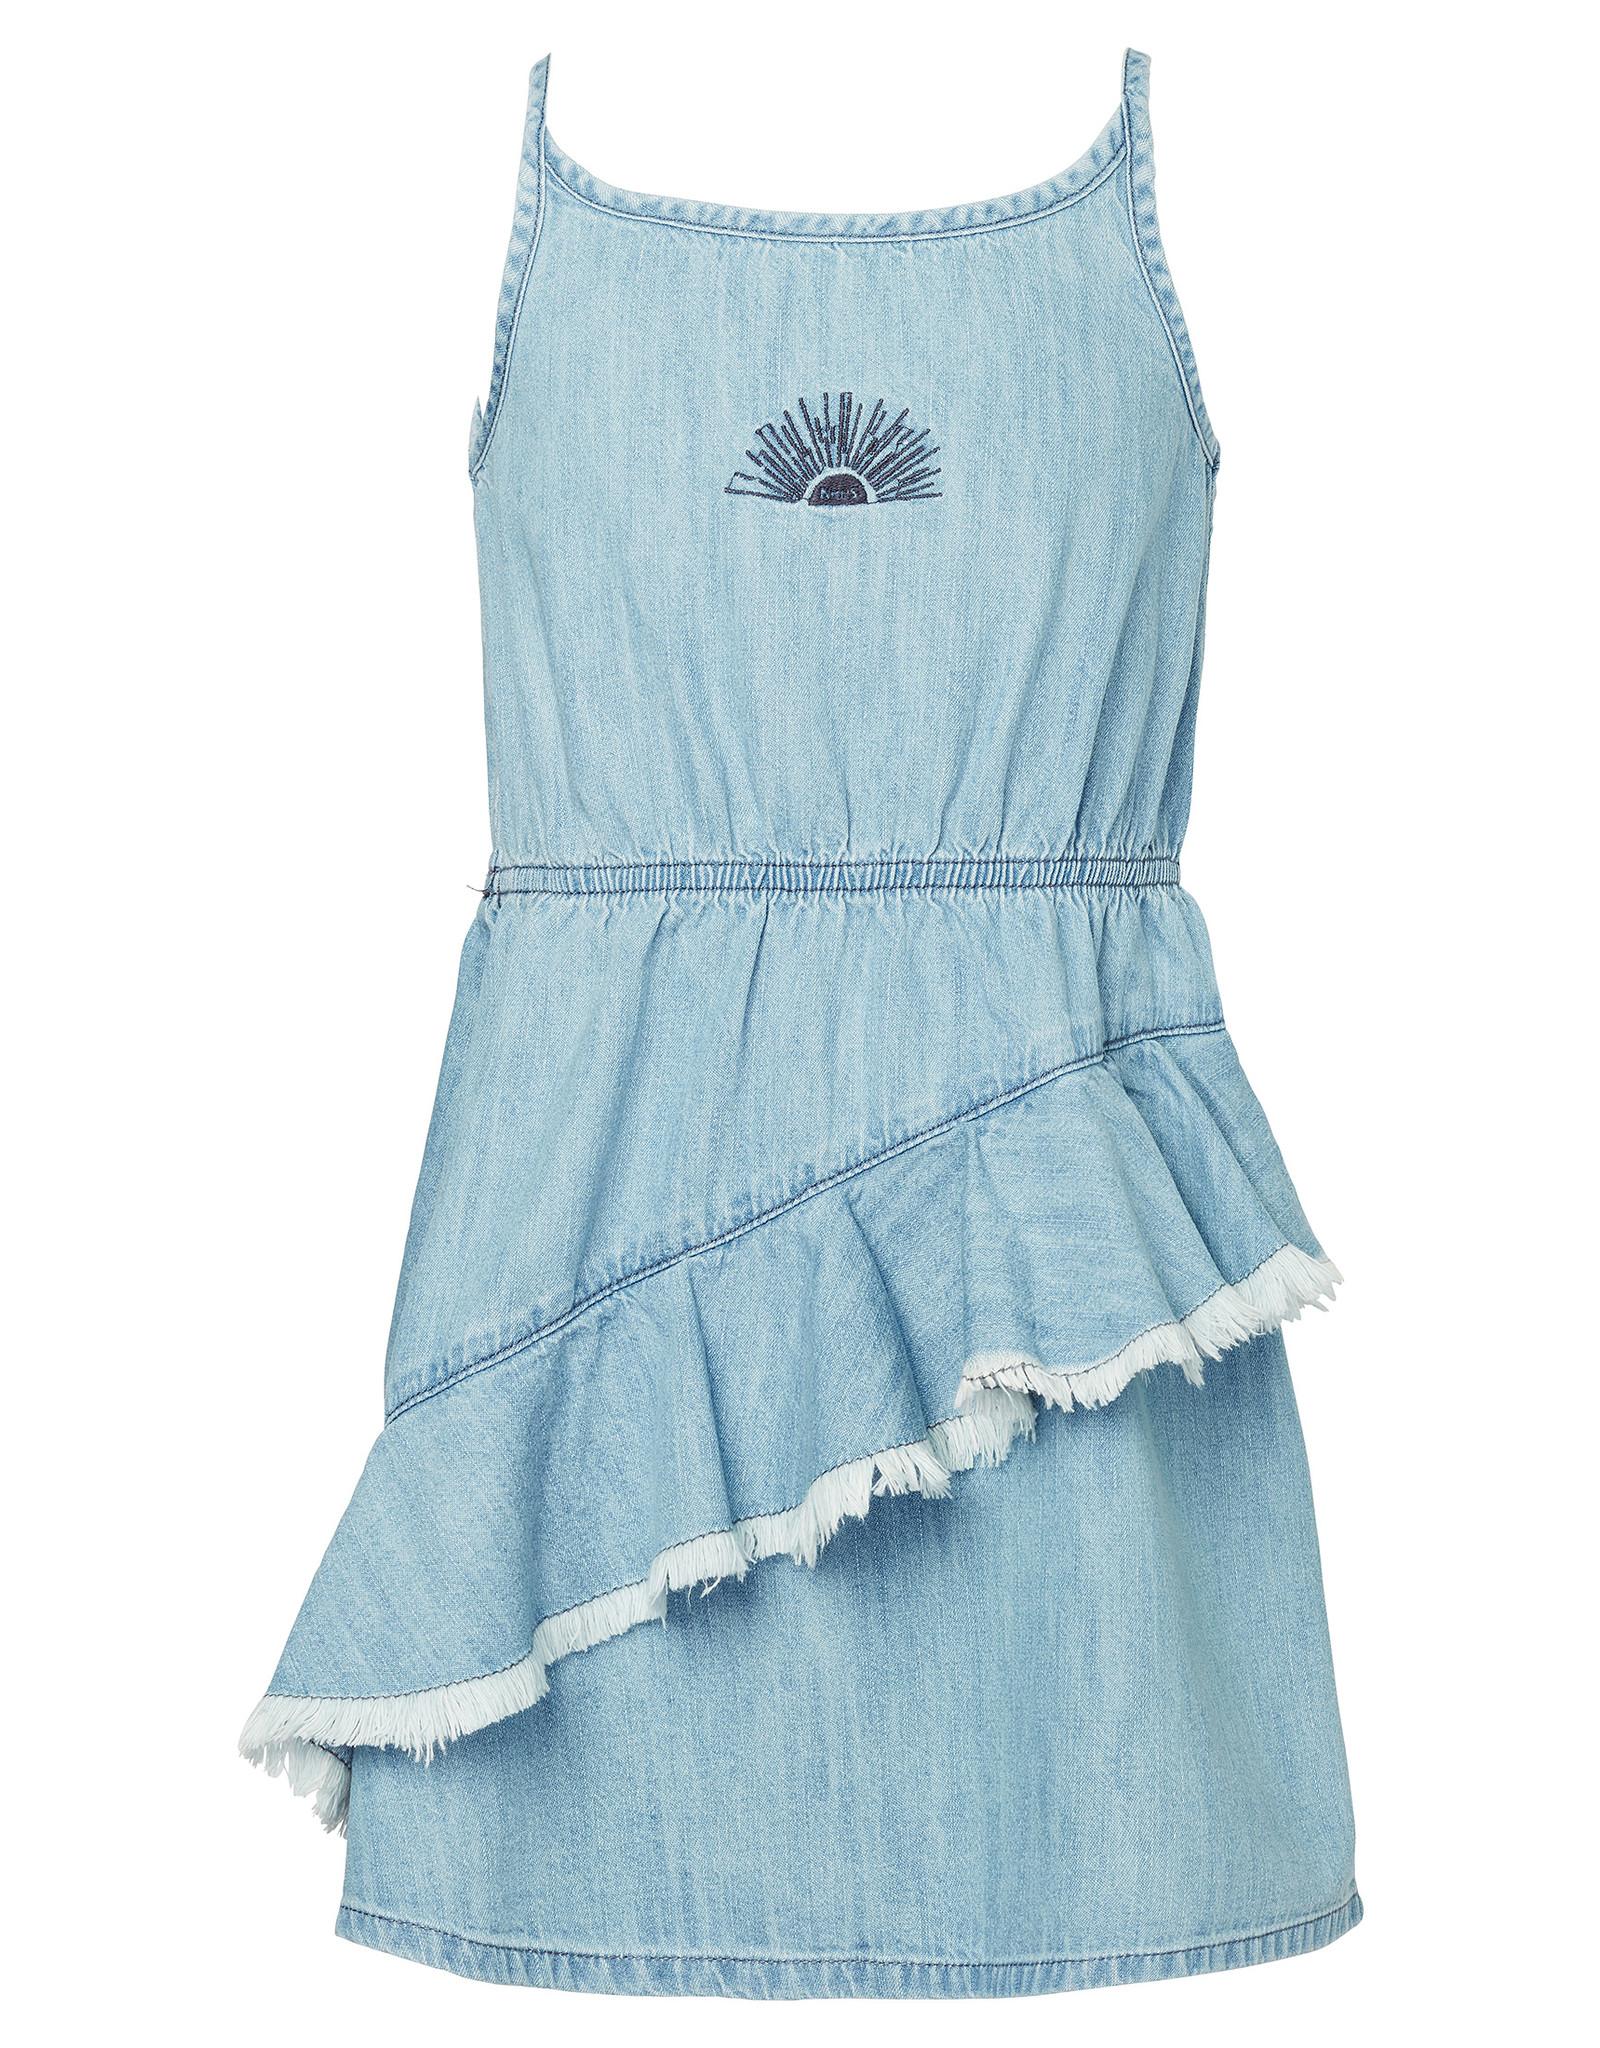 Noppies G Dress SS Leeswood, Light Vintage Wash